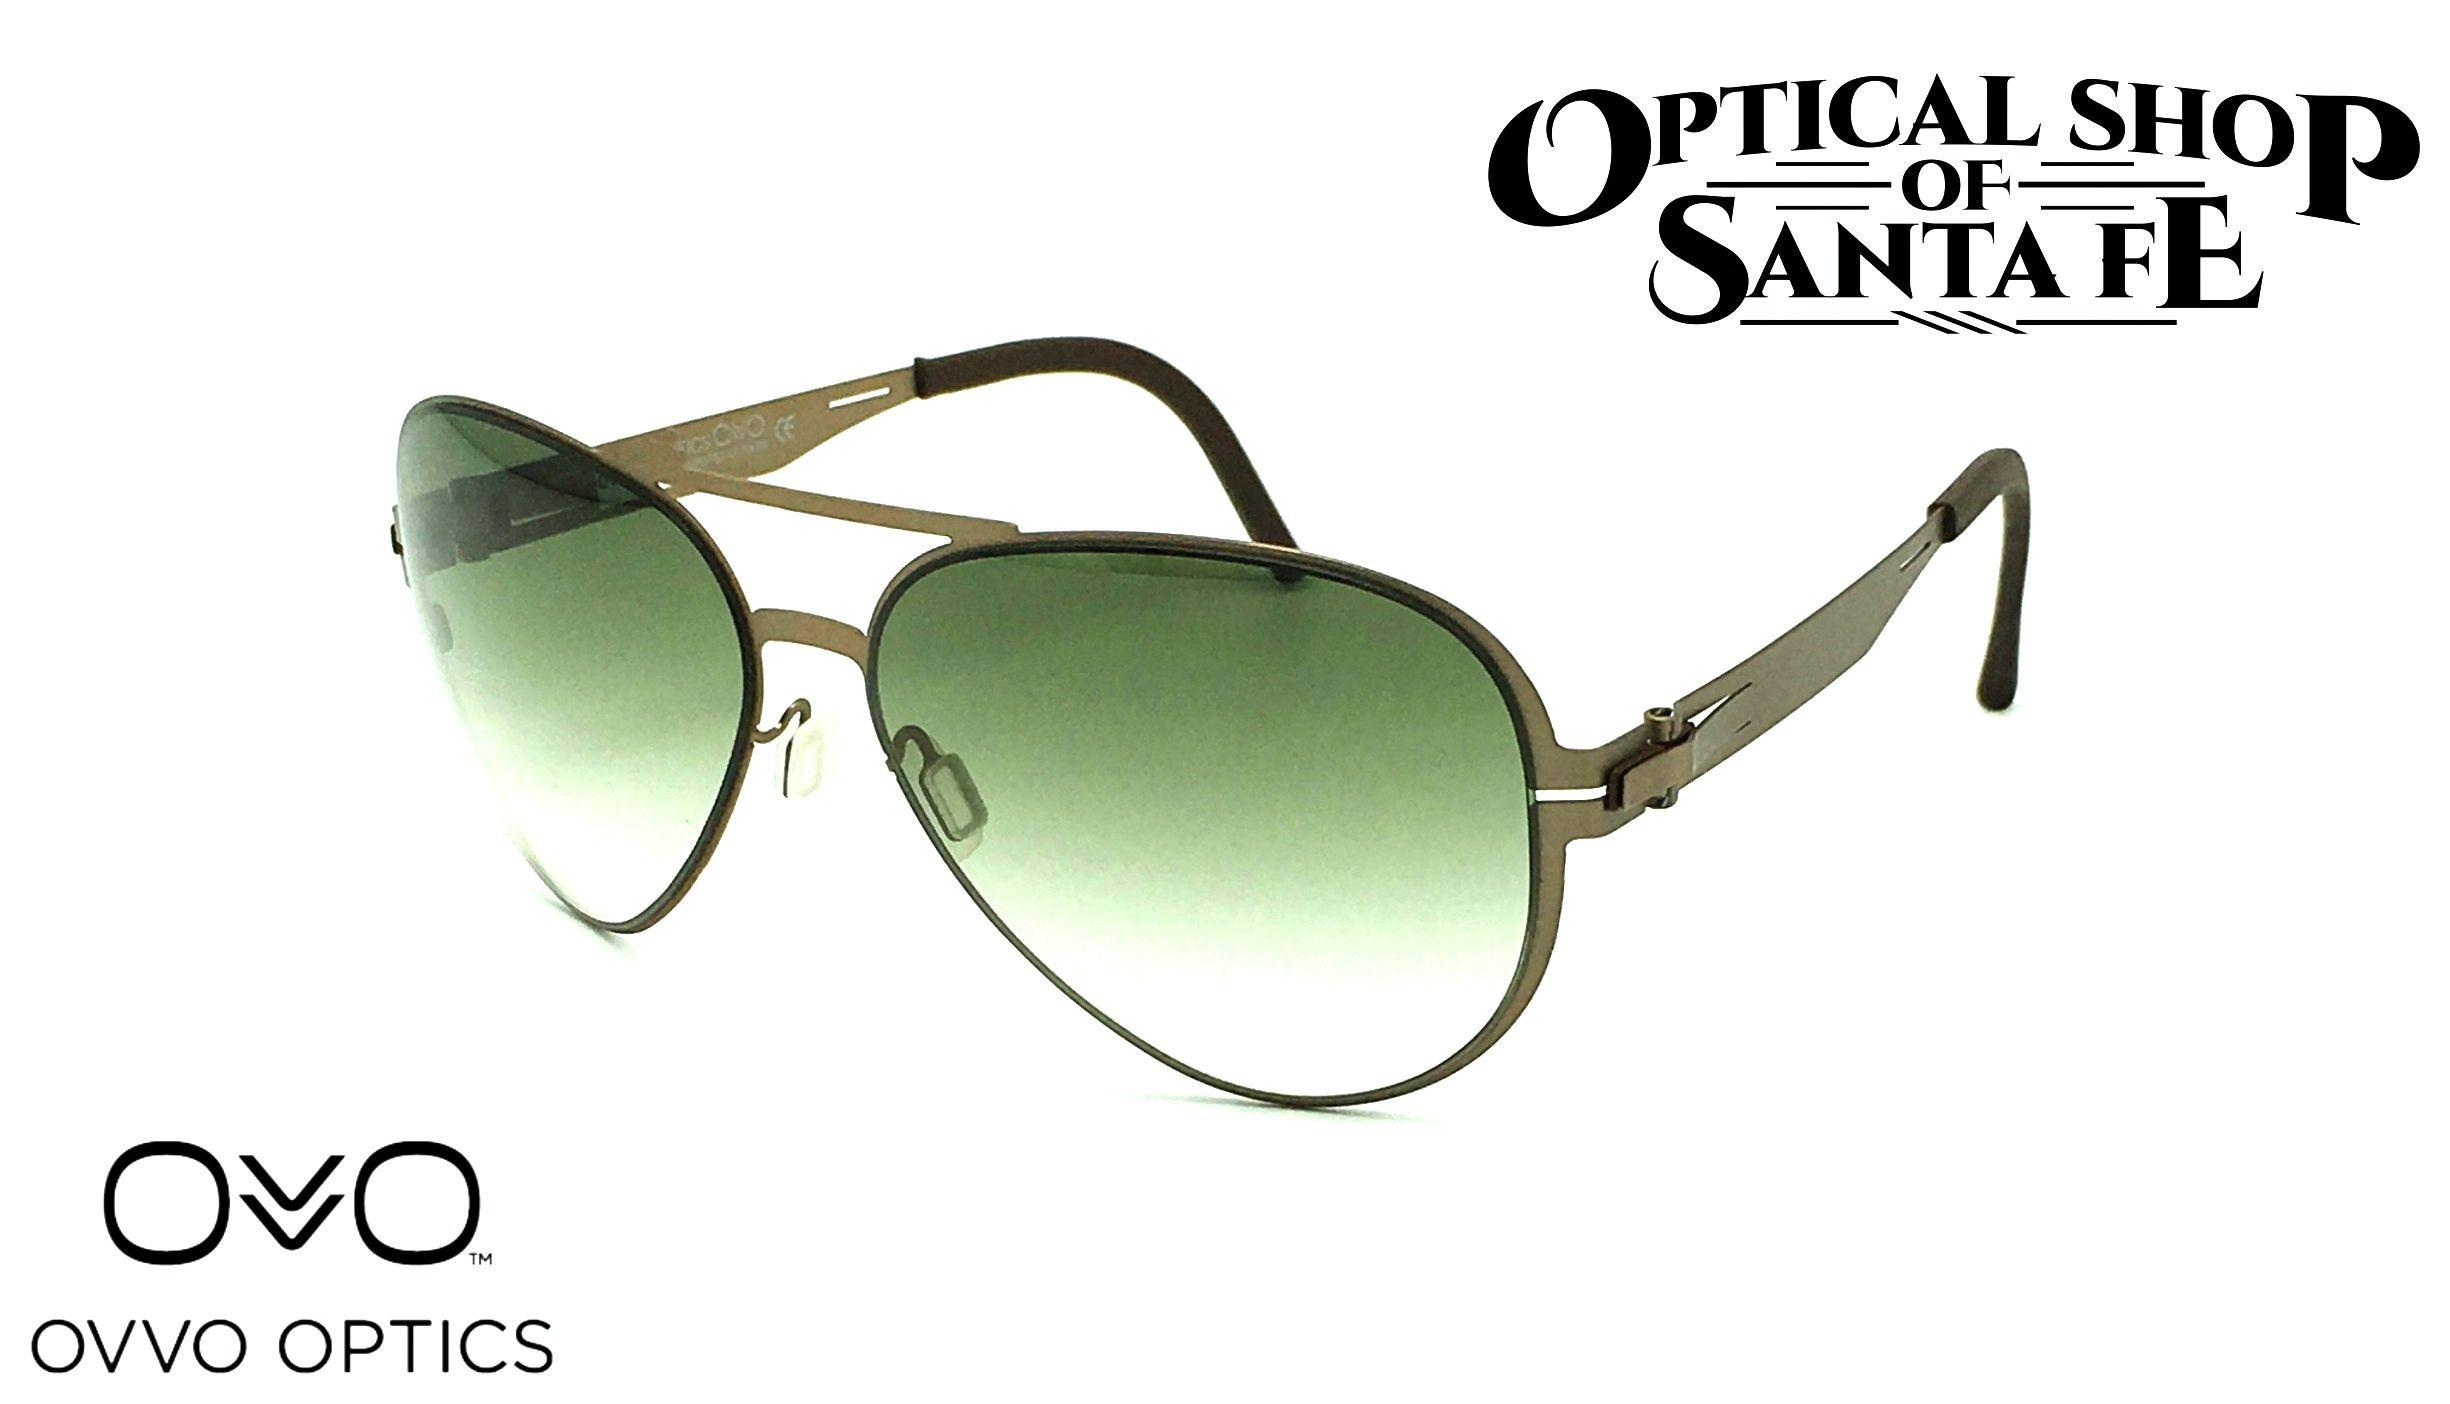 164ed6e79d Ovvo Optical Sunglasses   Eyewear